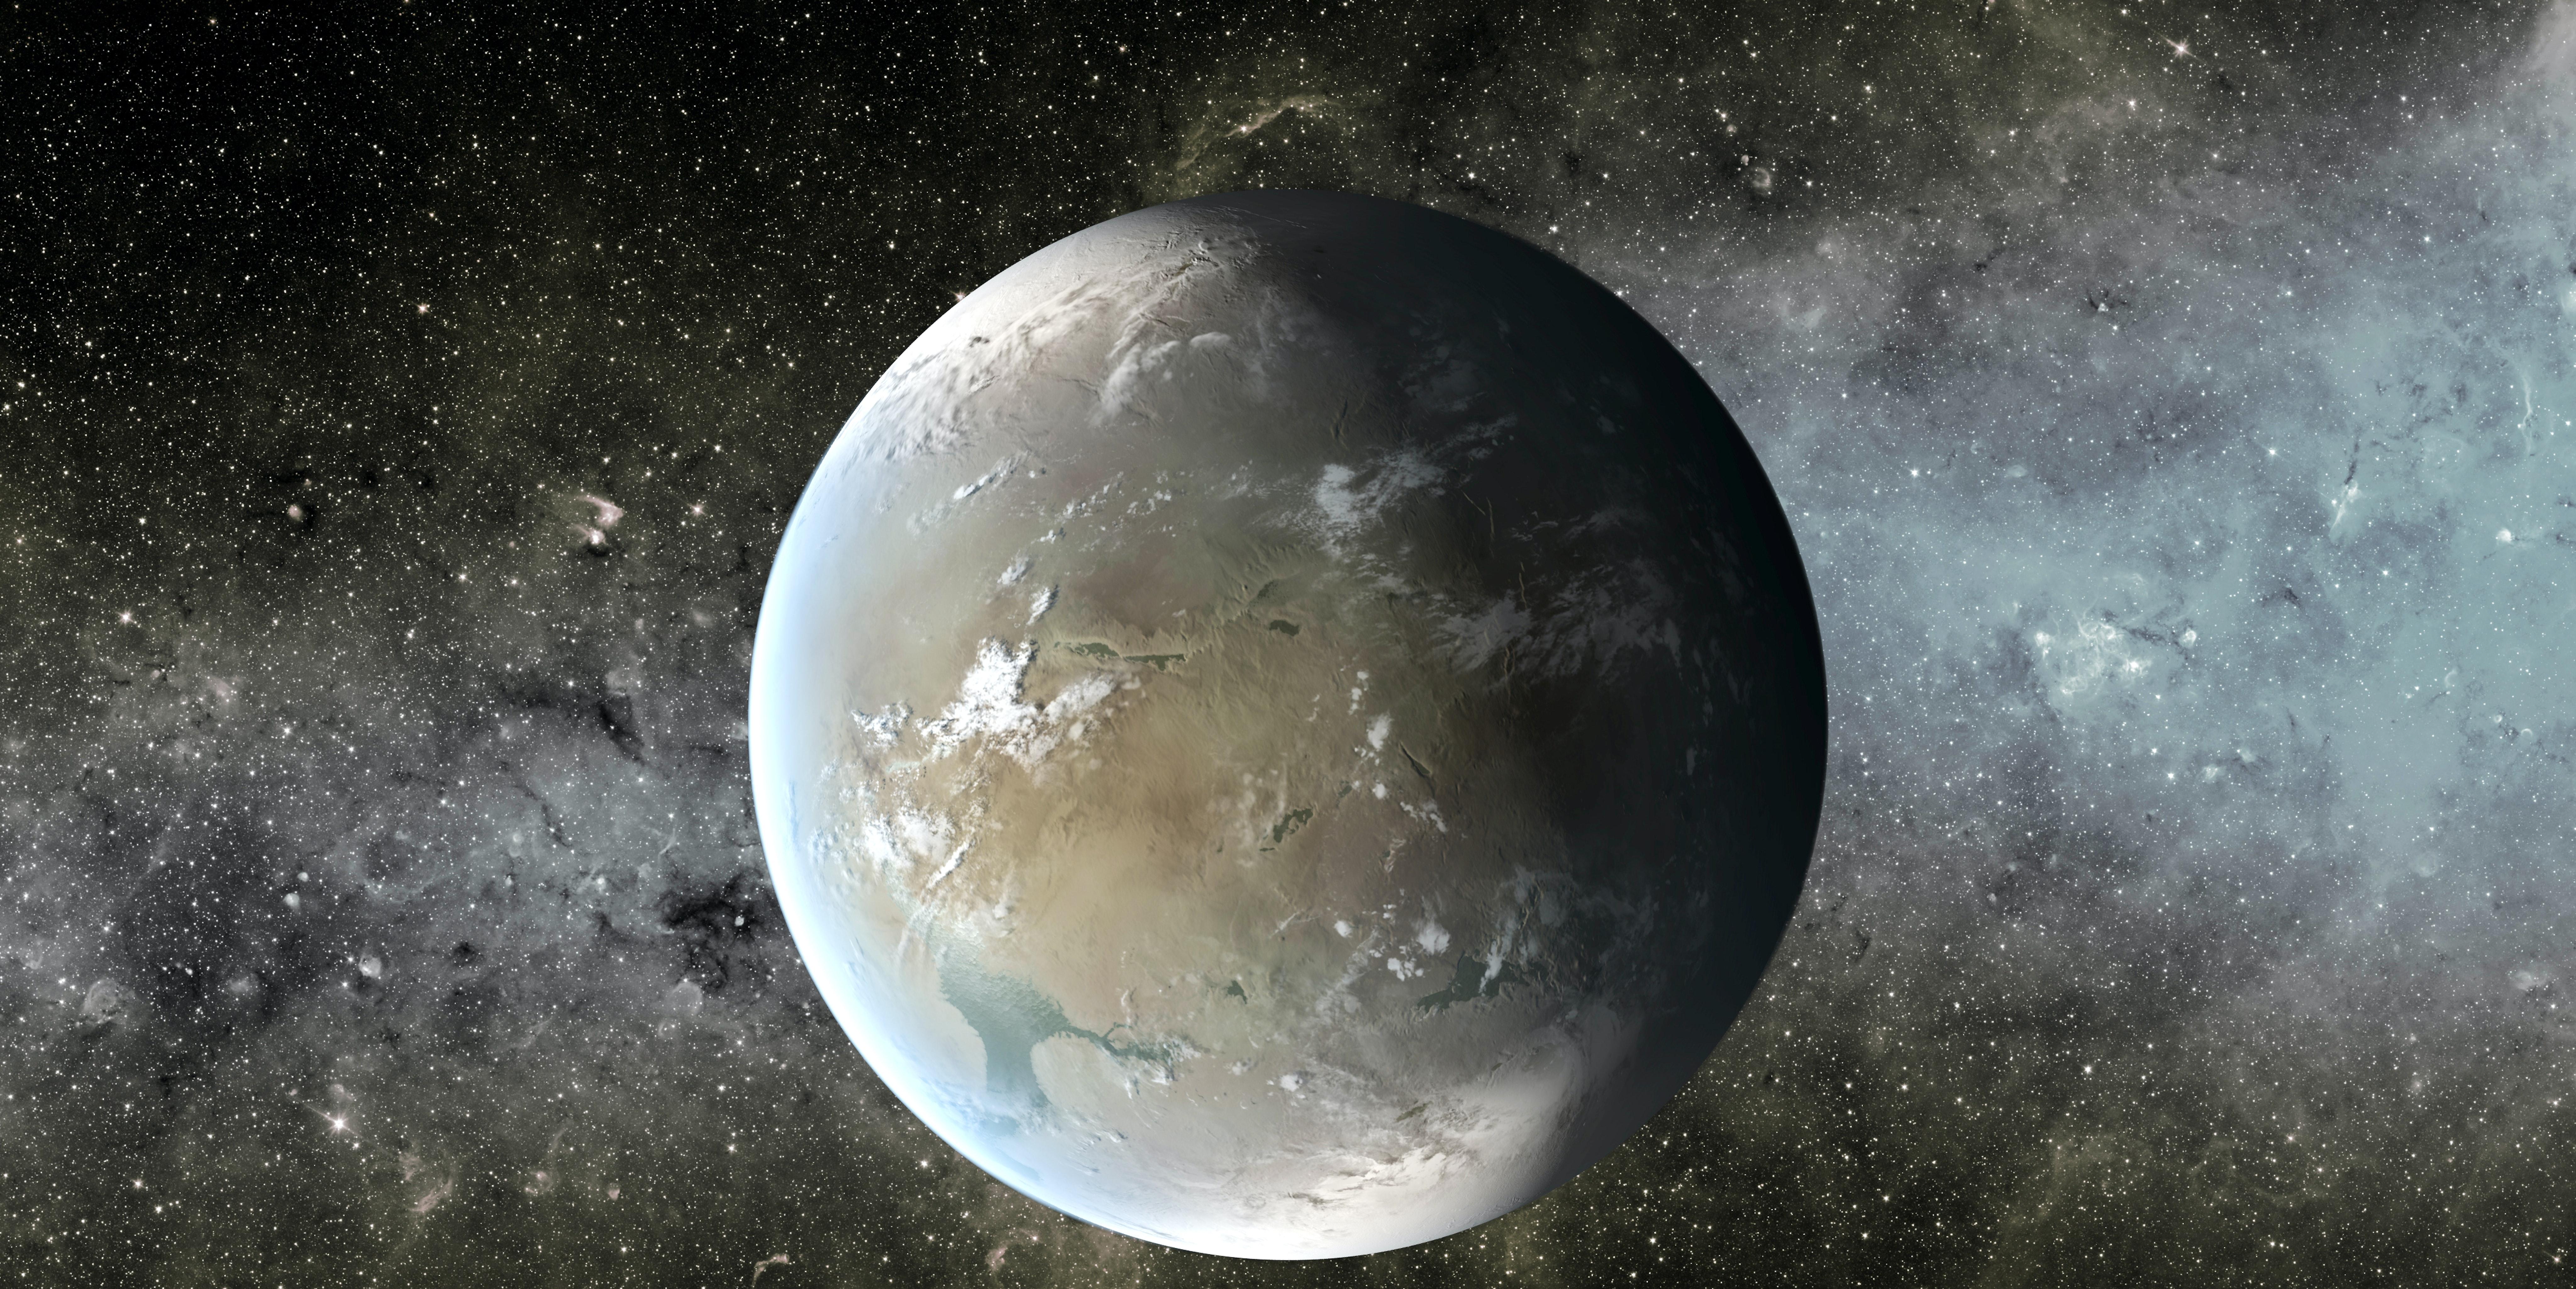 Astrobiology Web